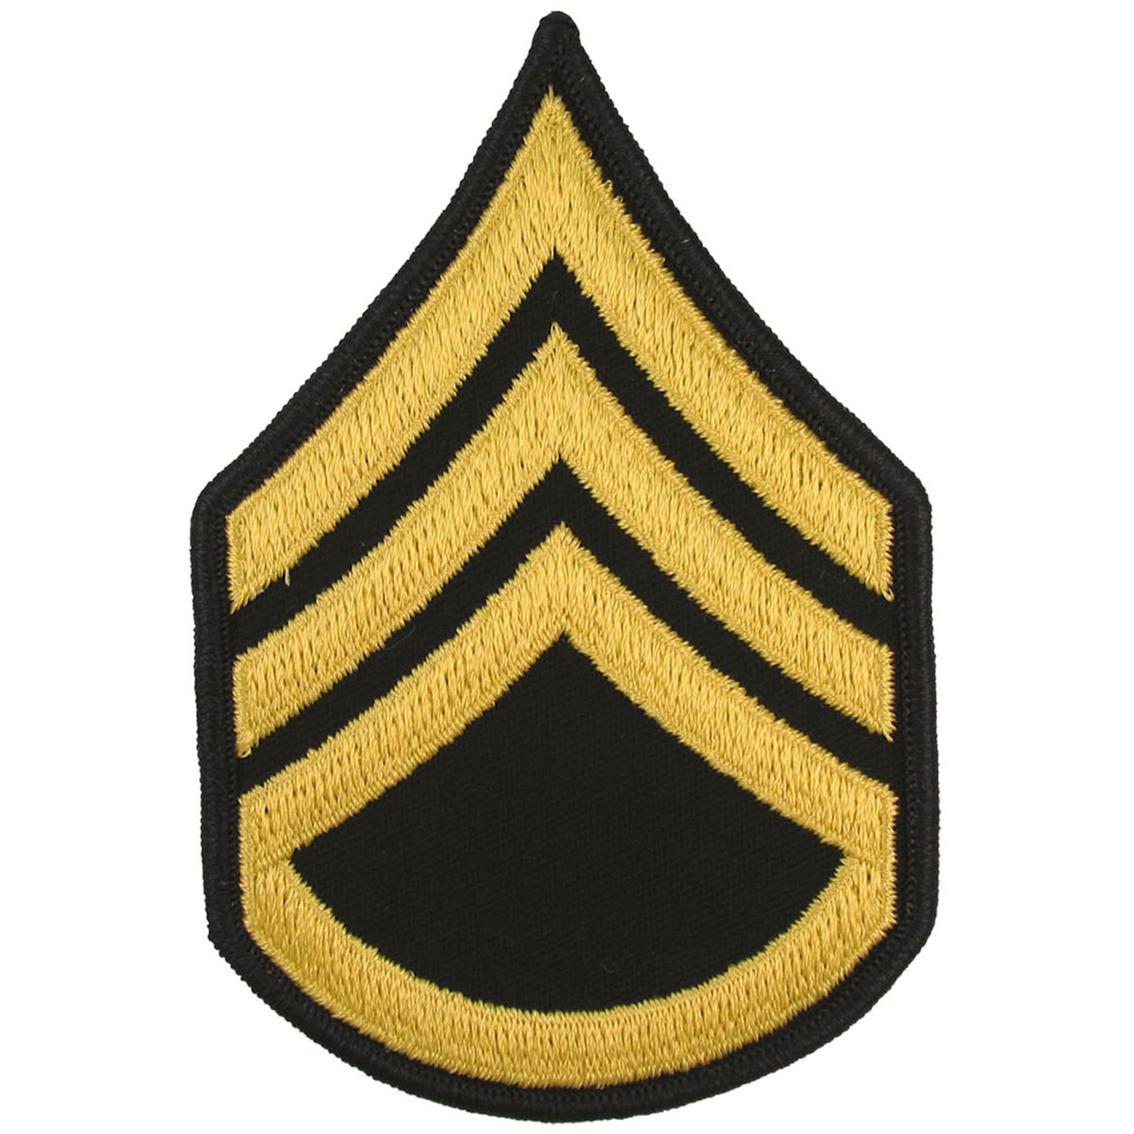 army rank ssg large asu sew on large asu rank military shop